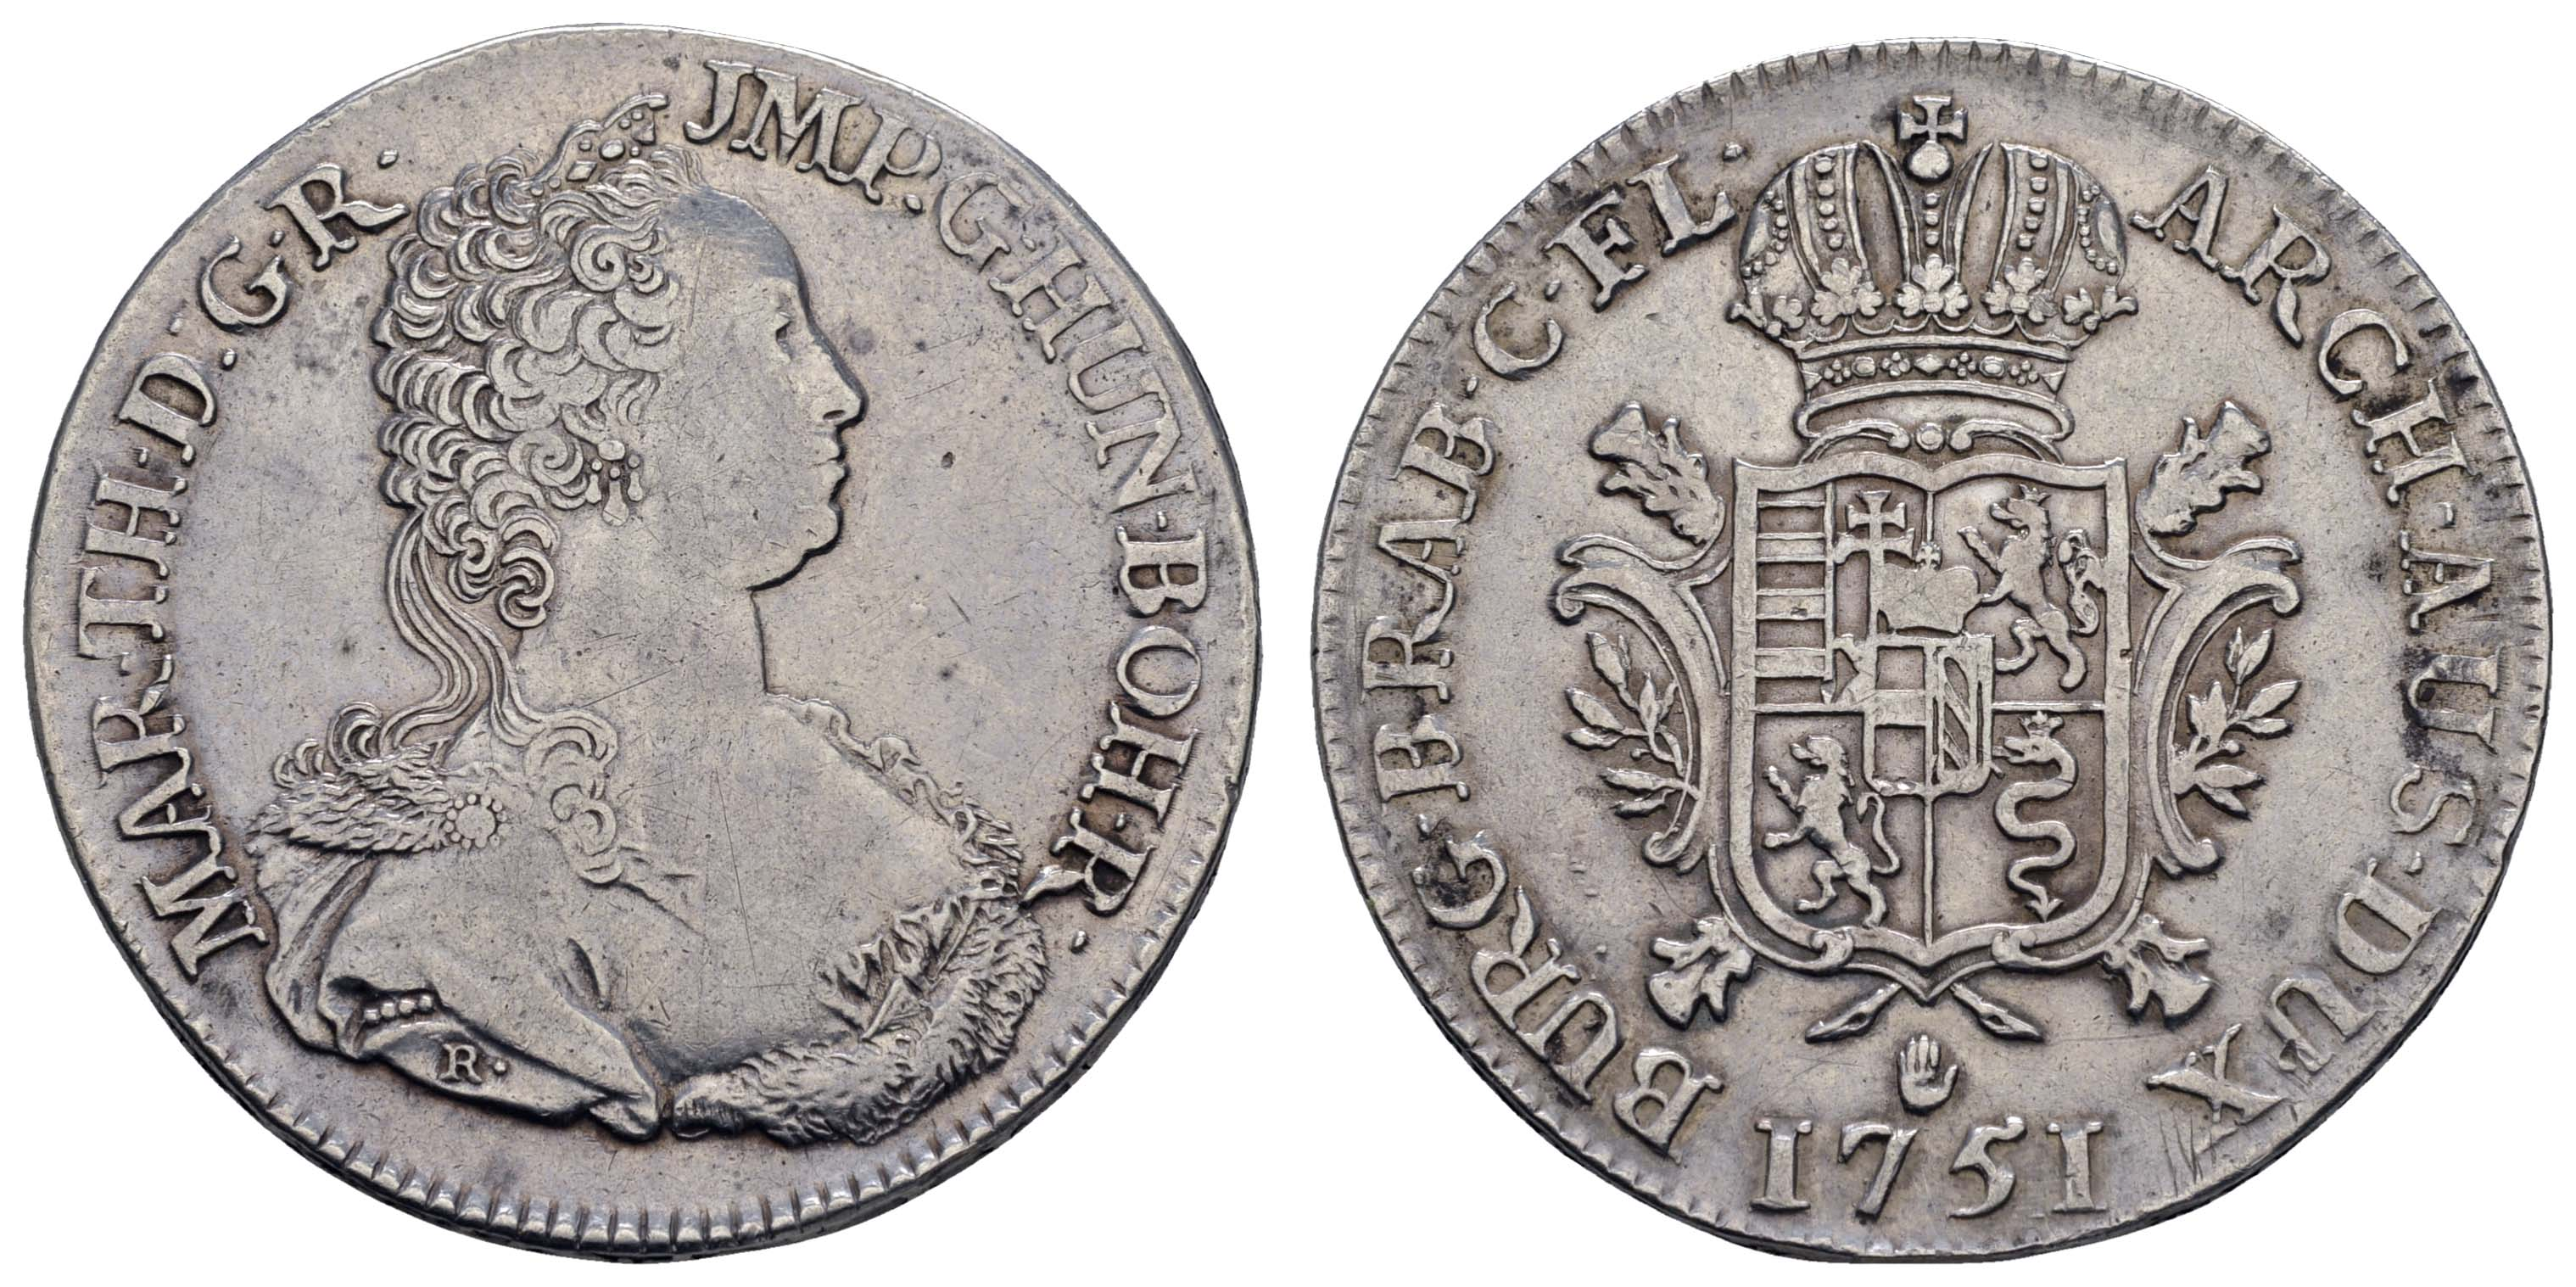 Lot 1340 - europa bis 1799 - Habsburg -  Auktionshaus Ulrich Felzmann GmbH & Co. KG Coins single lots